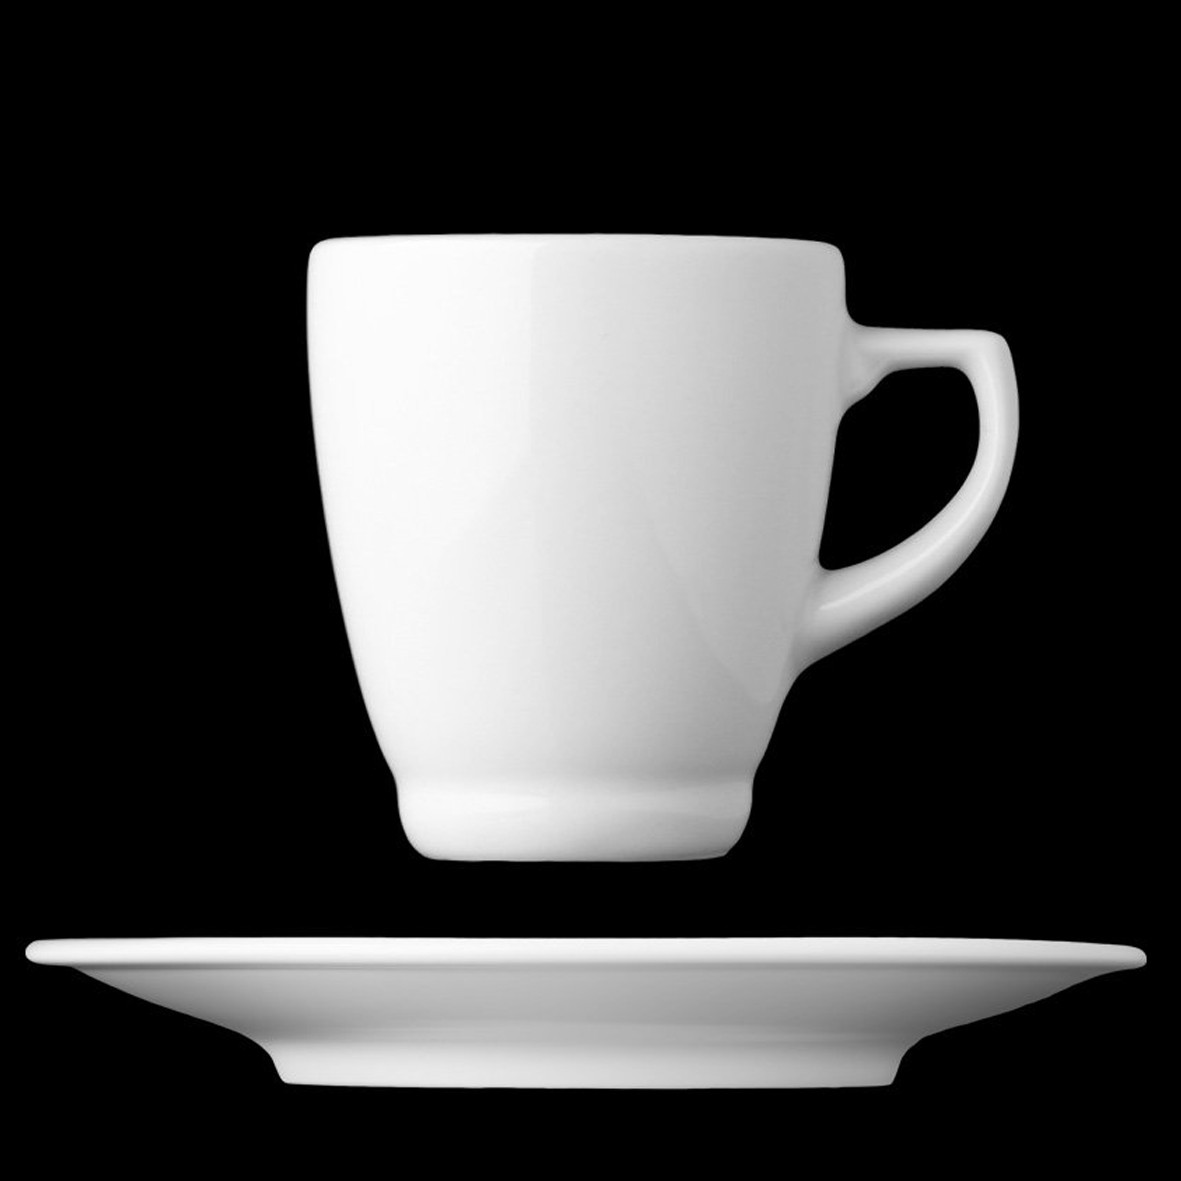 Чашка c блюдцем - 80 мл (G.Benedikt) Excellency